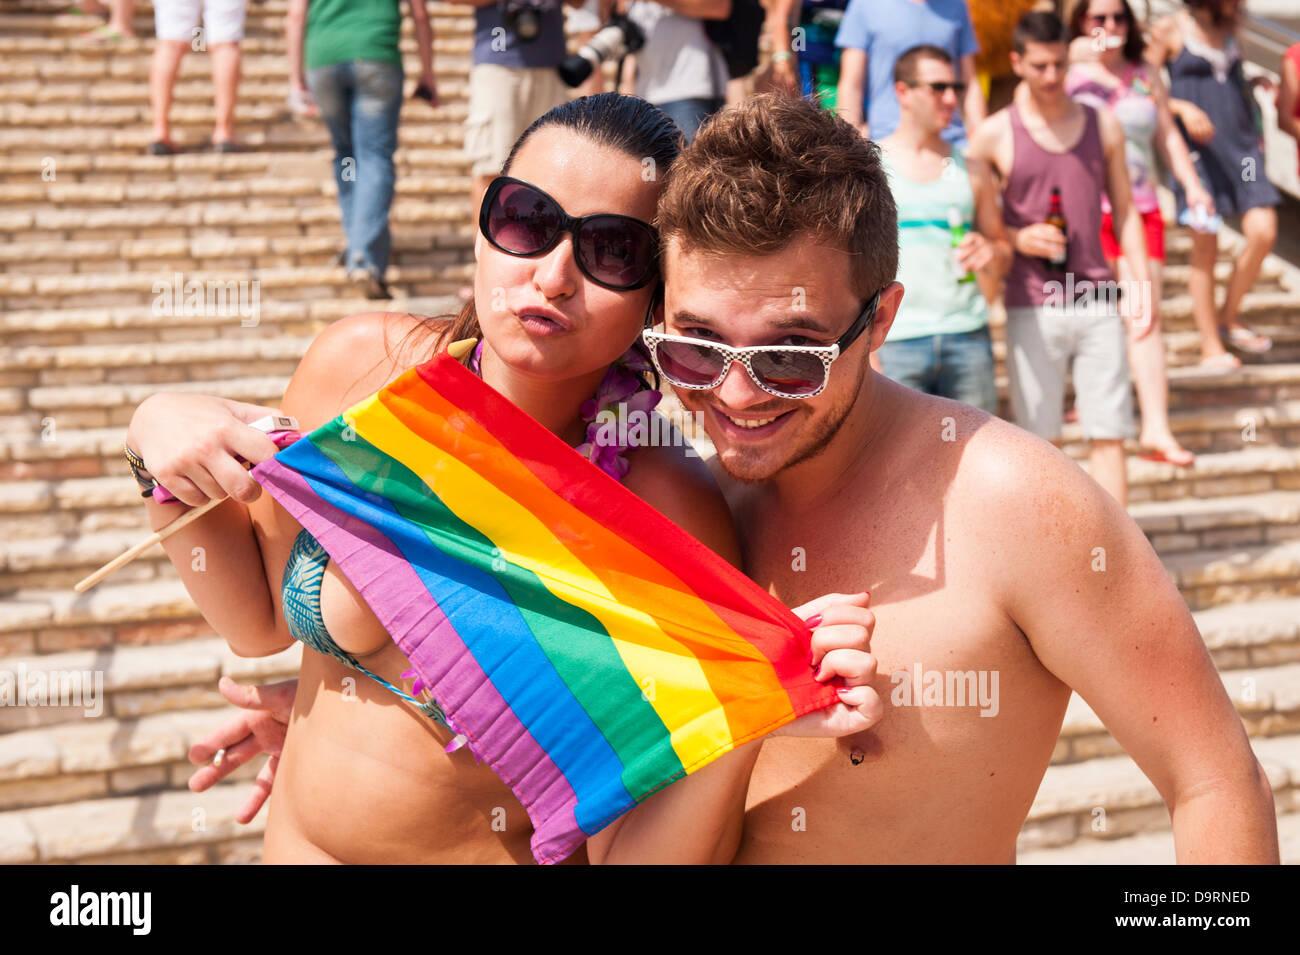 Gay barcelona escort